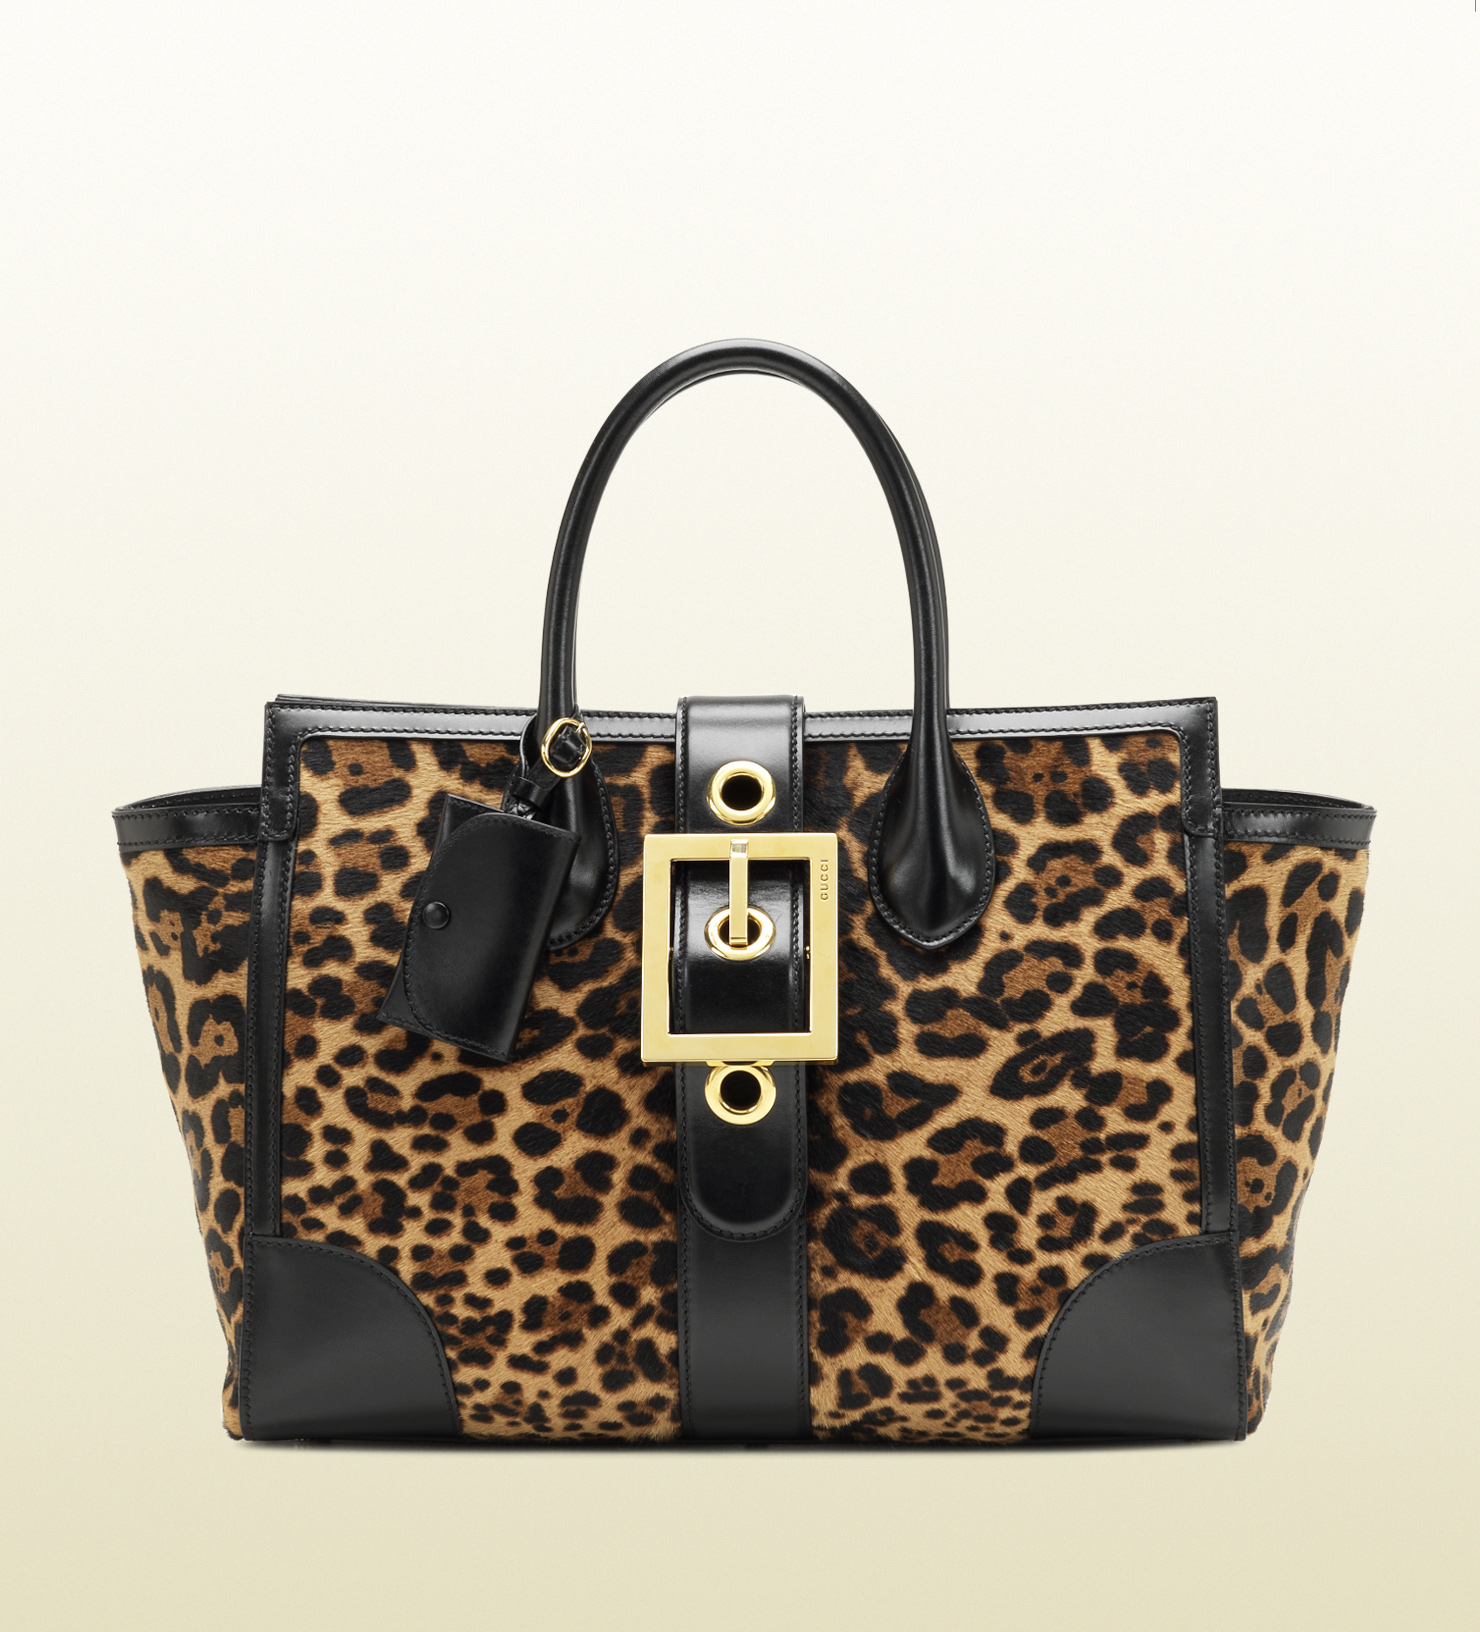 canvas valentino shoulder img jaguar brown handbags handbag trim leather tan rhinestone